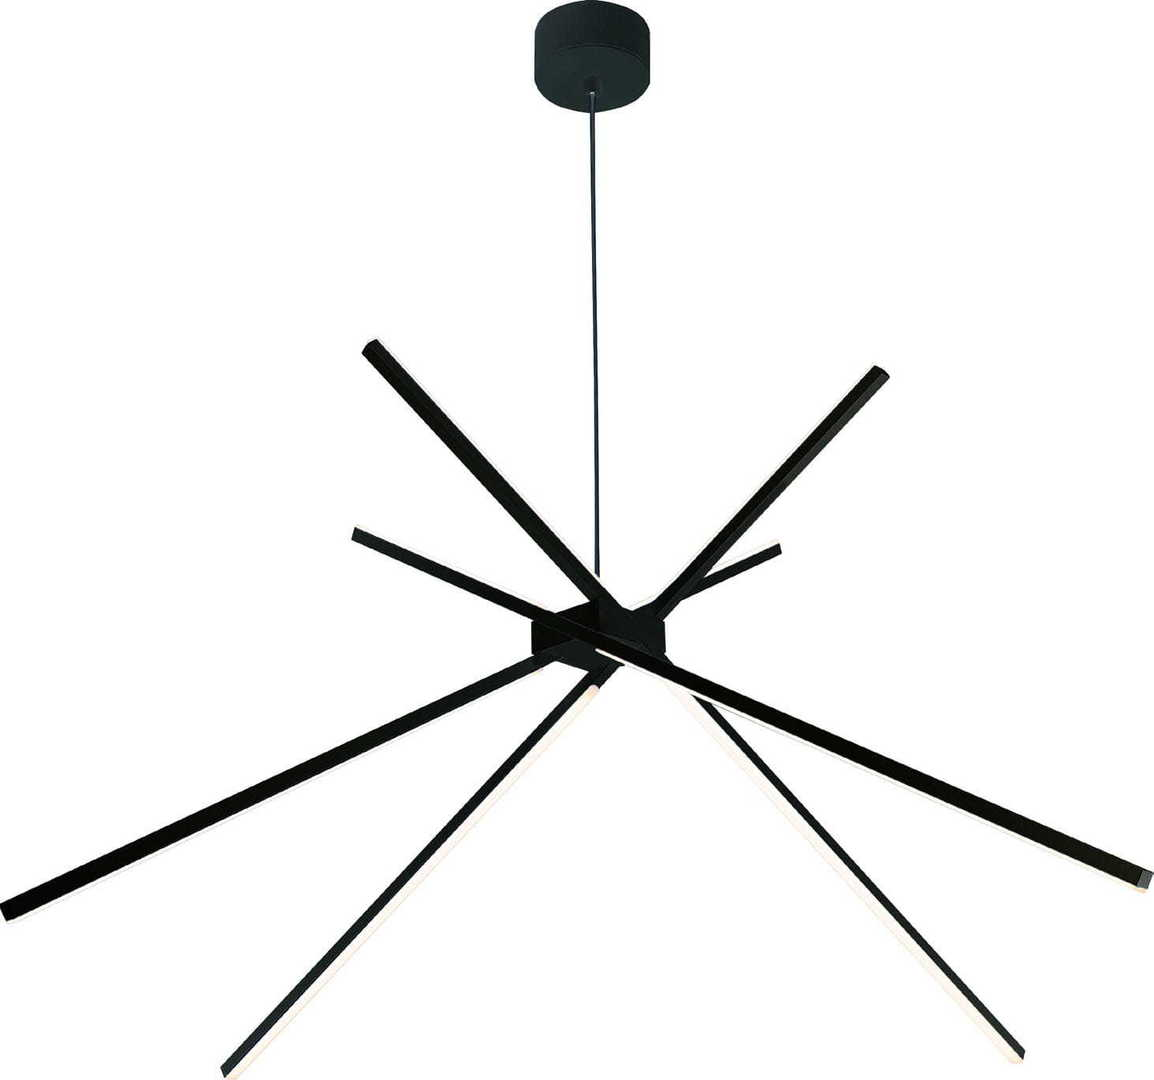 SPIDER P0412 HANGING LAMP Max Light